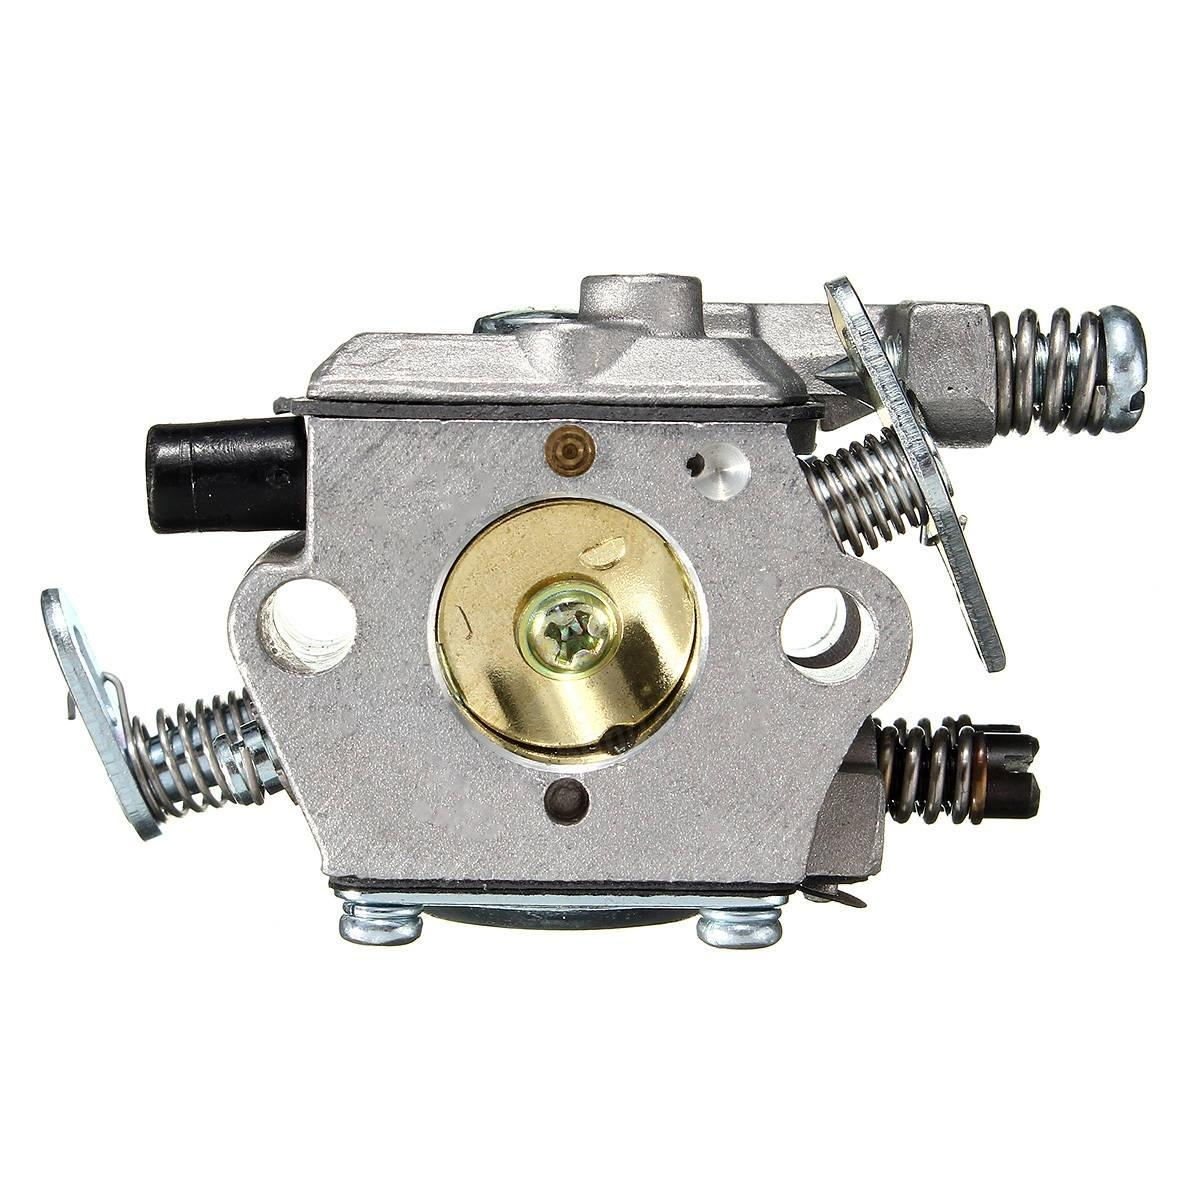 Benzin Chainsaw için yedek karbüratör 021 023 025 MS210 MS230 MS250